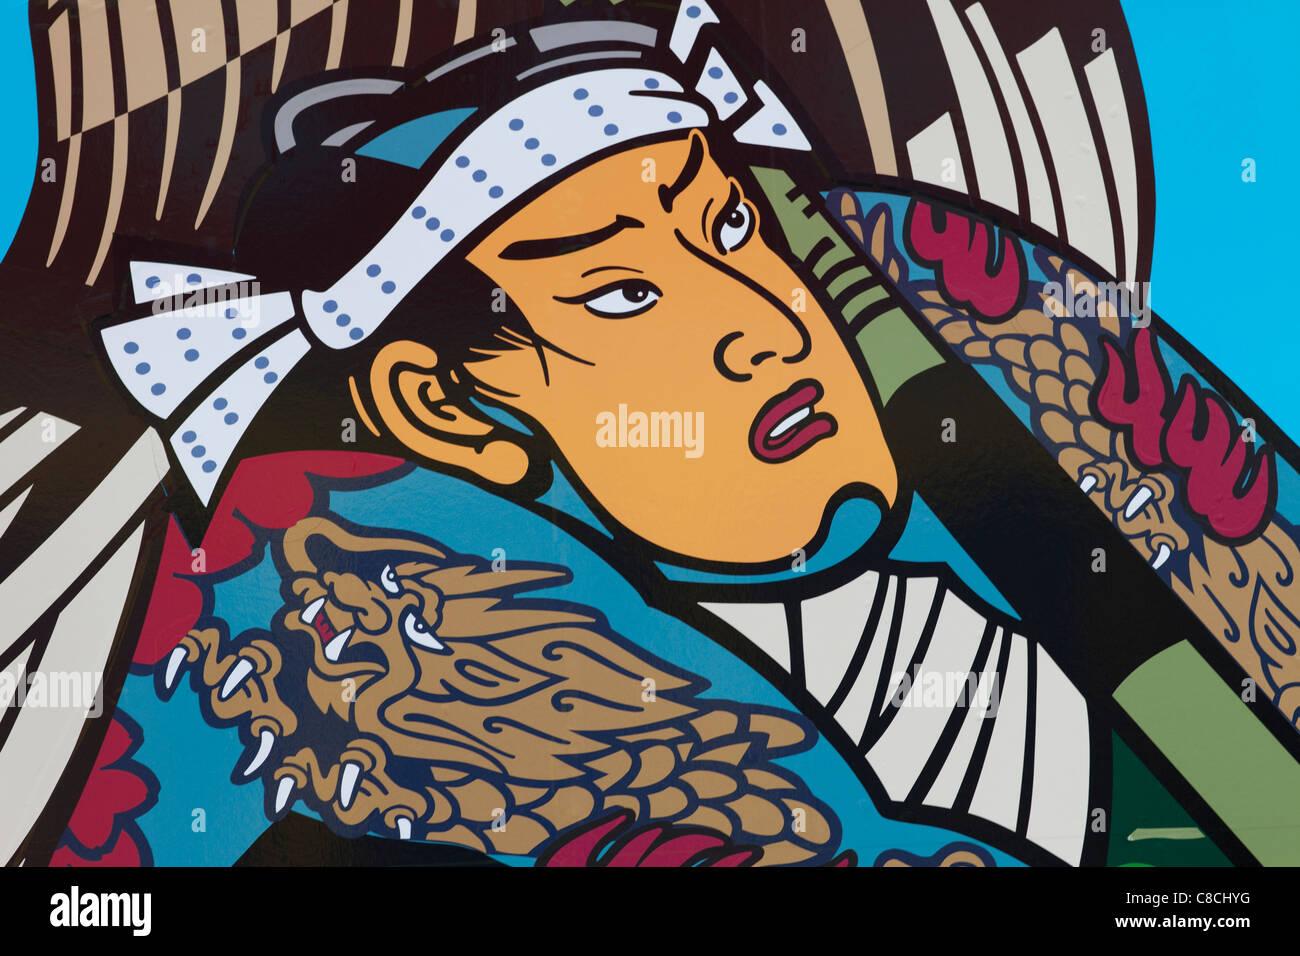 Japan, Tokyo, Ukiyo-e Style Artwork on Seafood Restaurant Facade - Stock Image